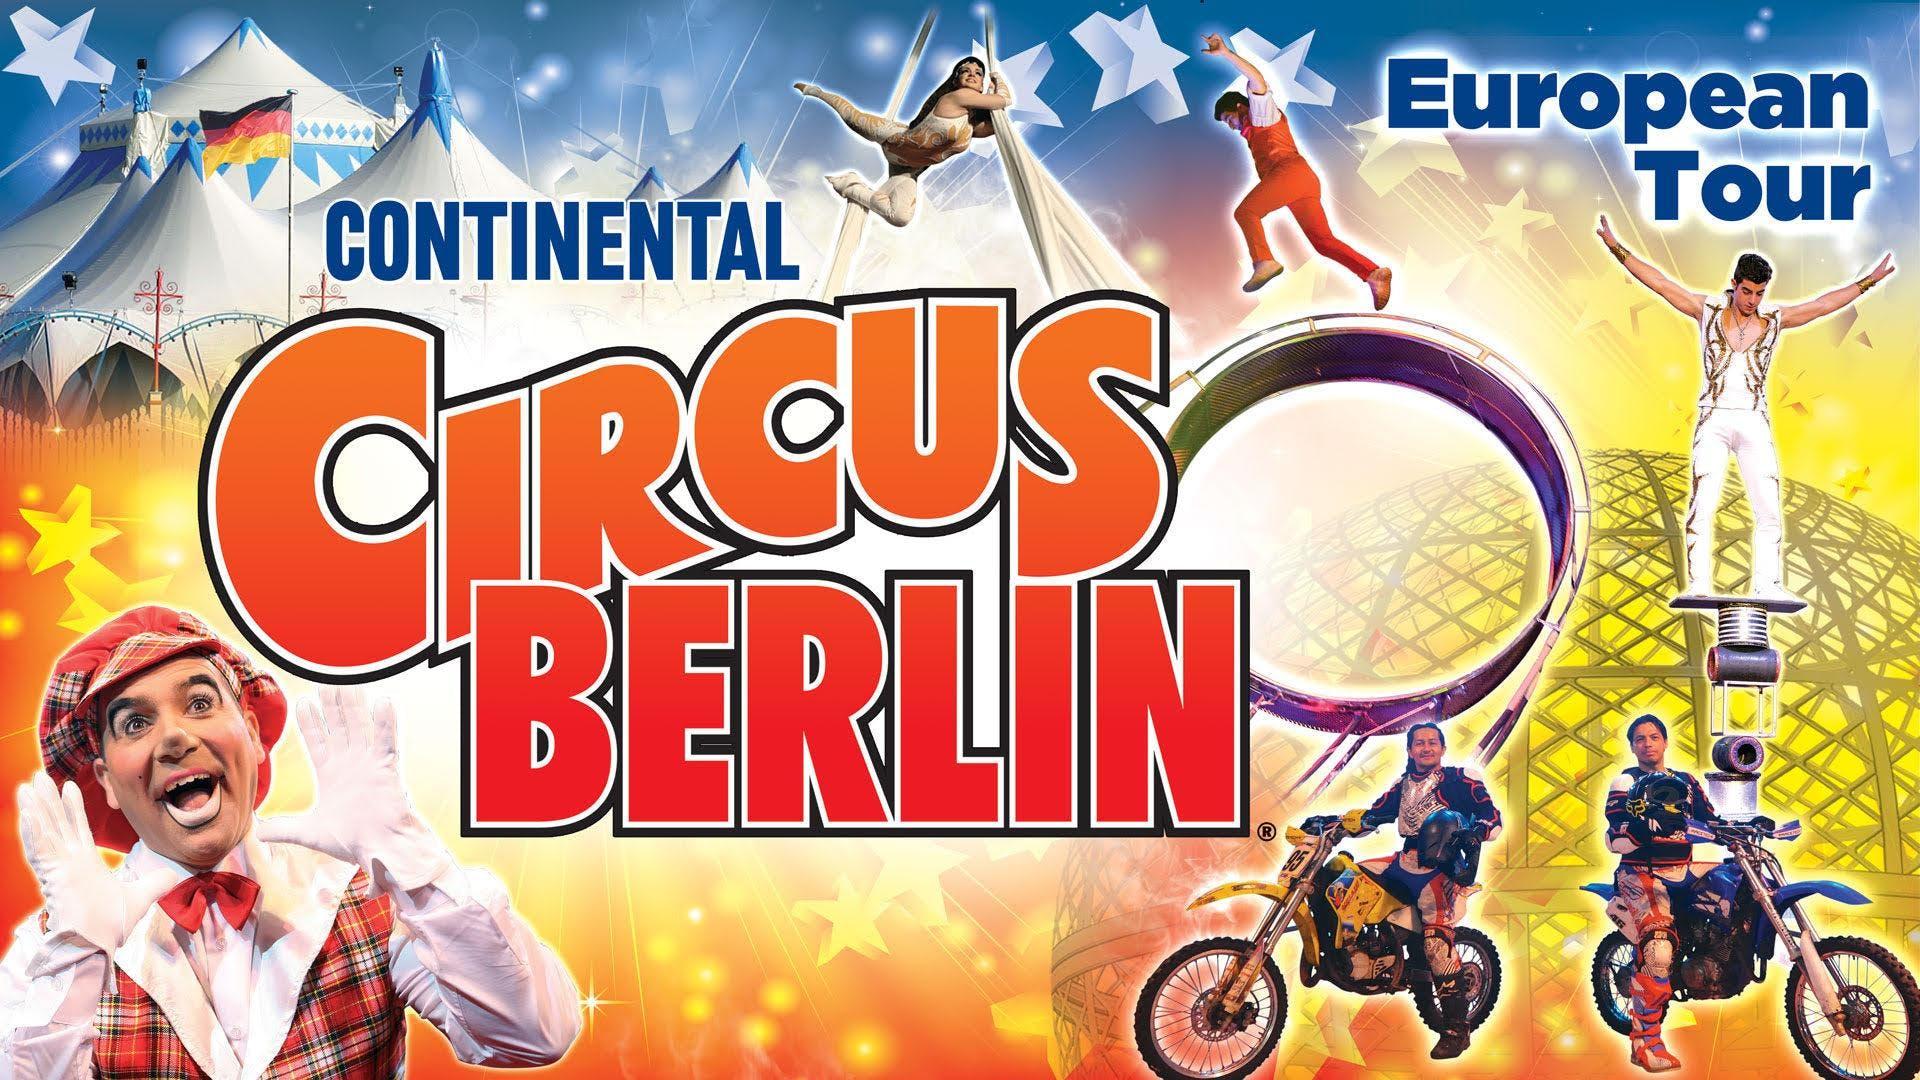 Continental Circus Berlin - Hull